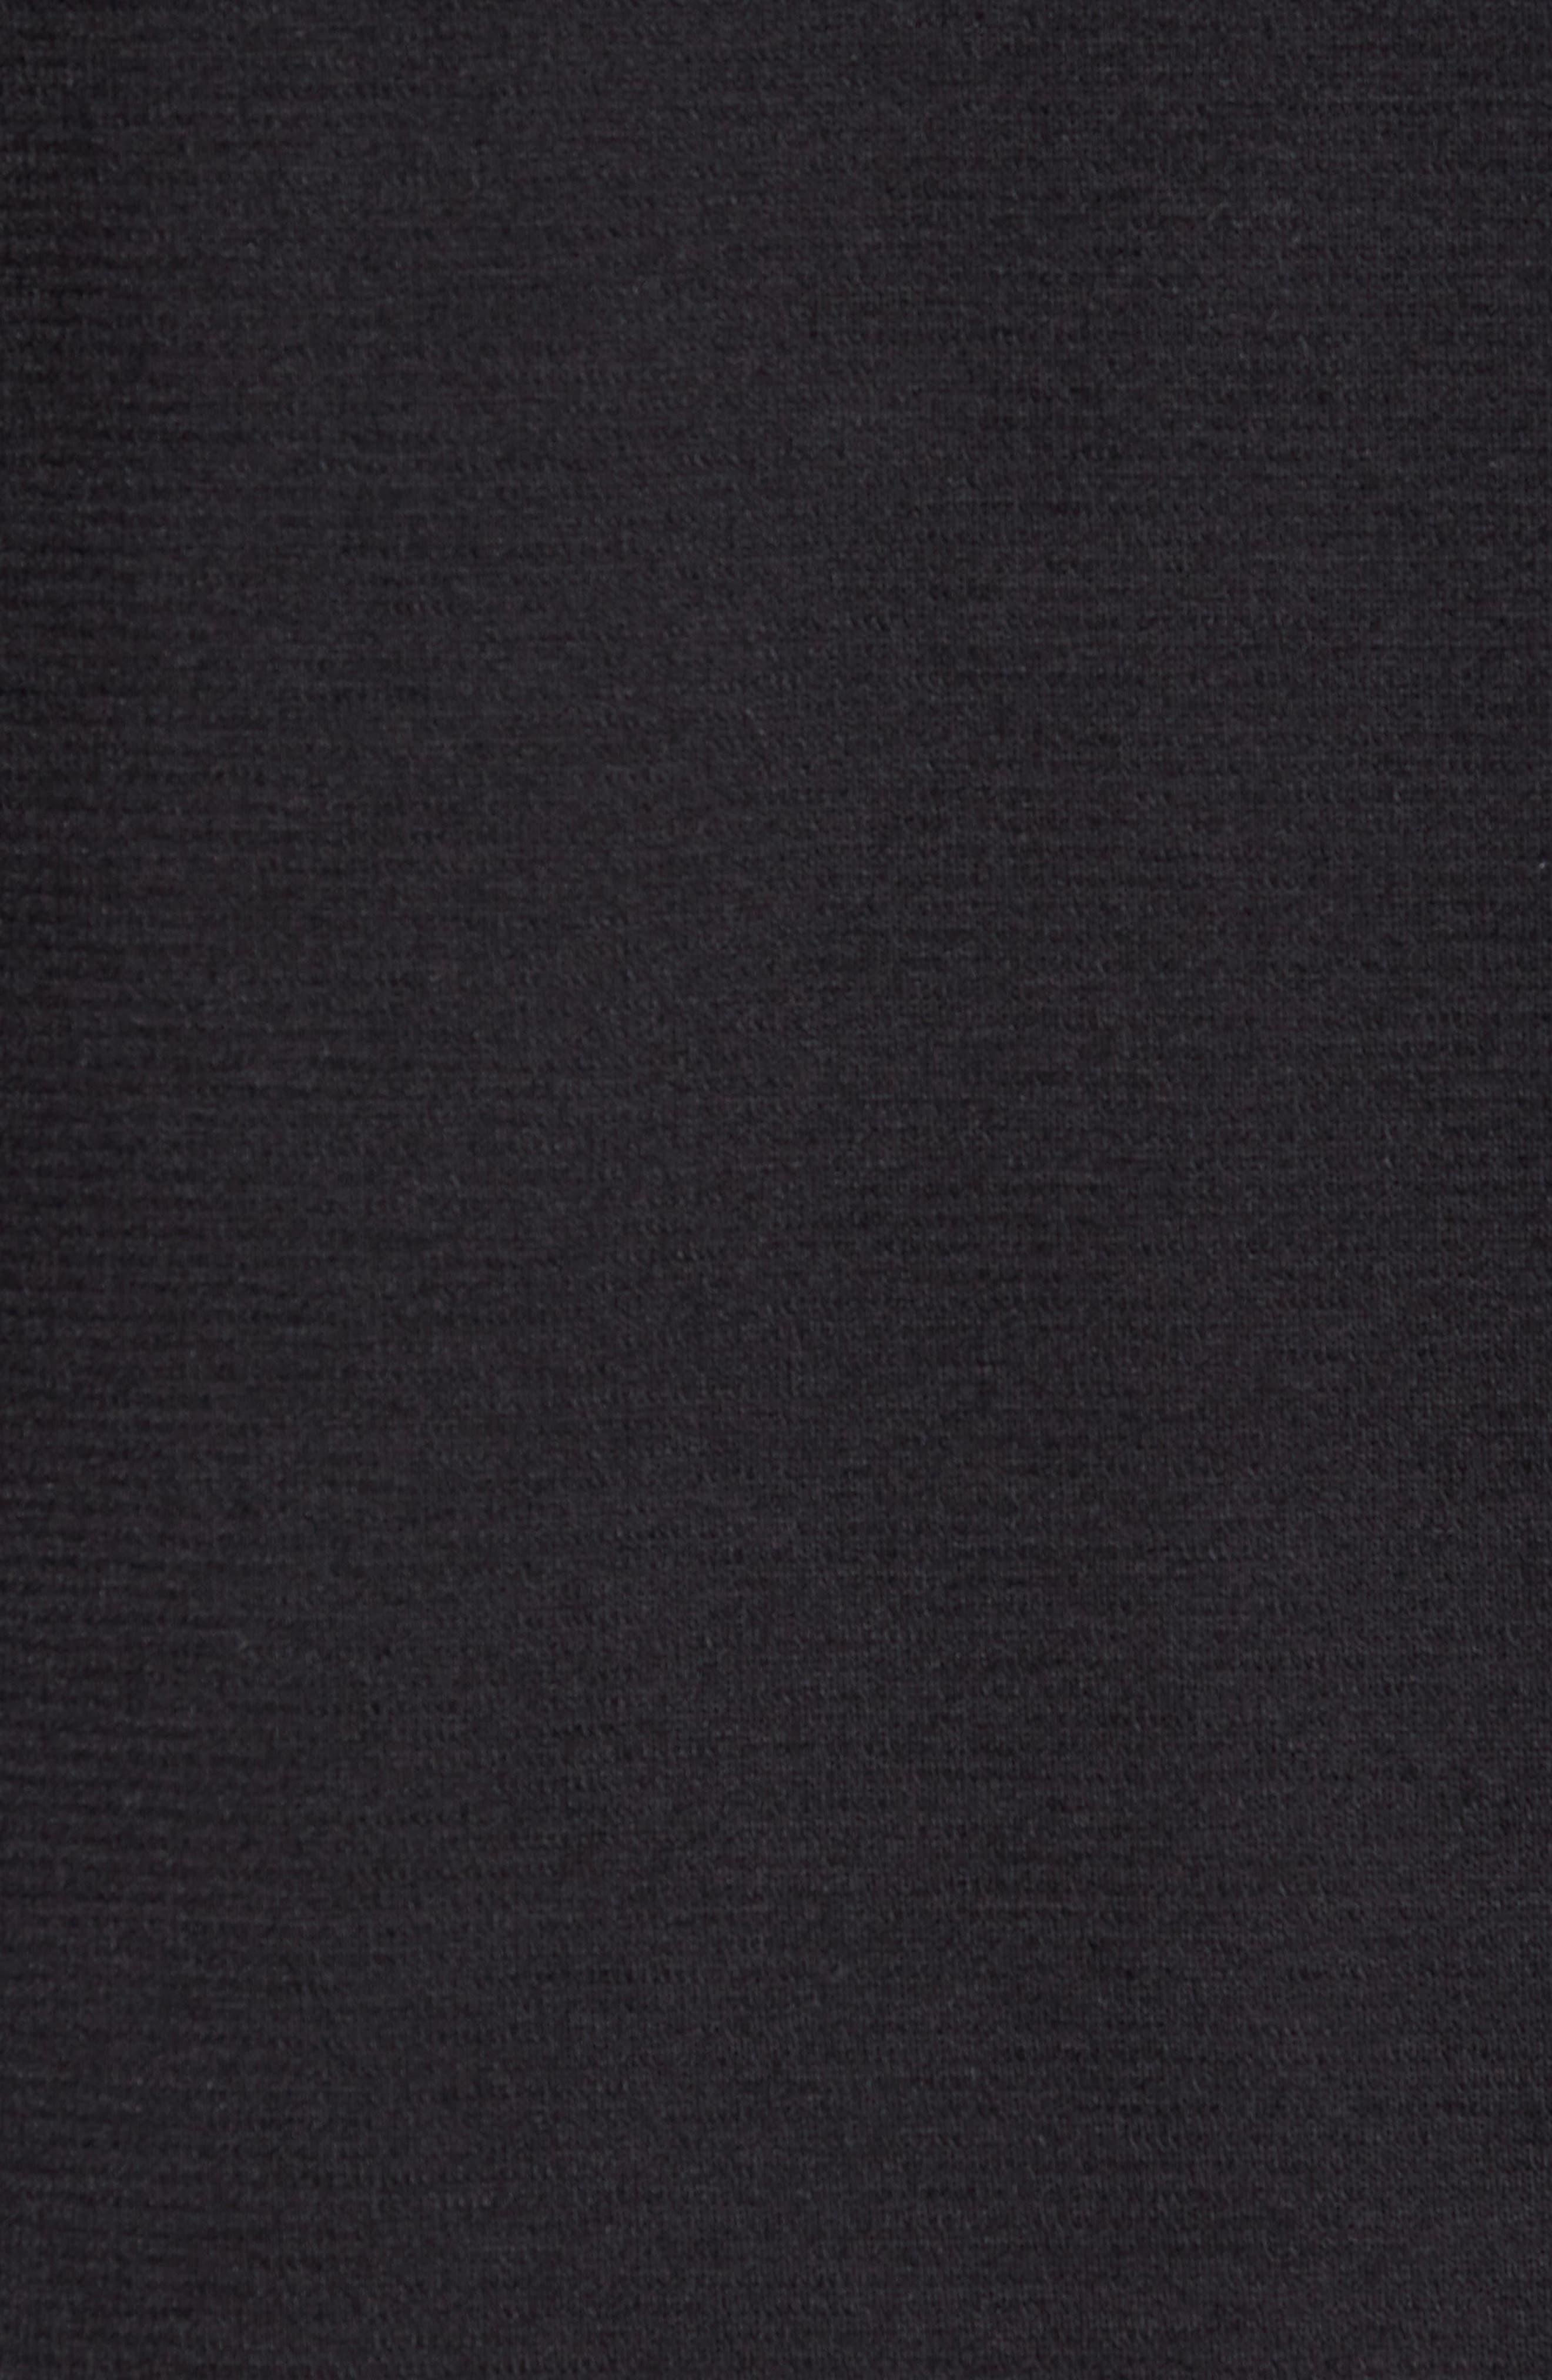 Crewneck Sweater,                             Alternate thumbnail 6, color,                             001